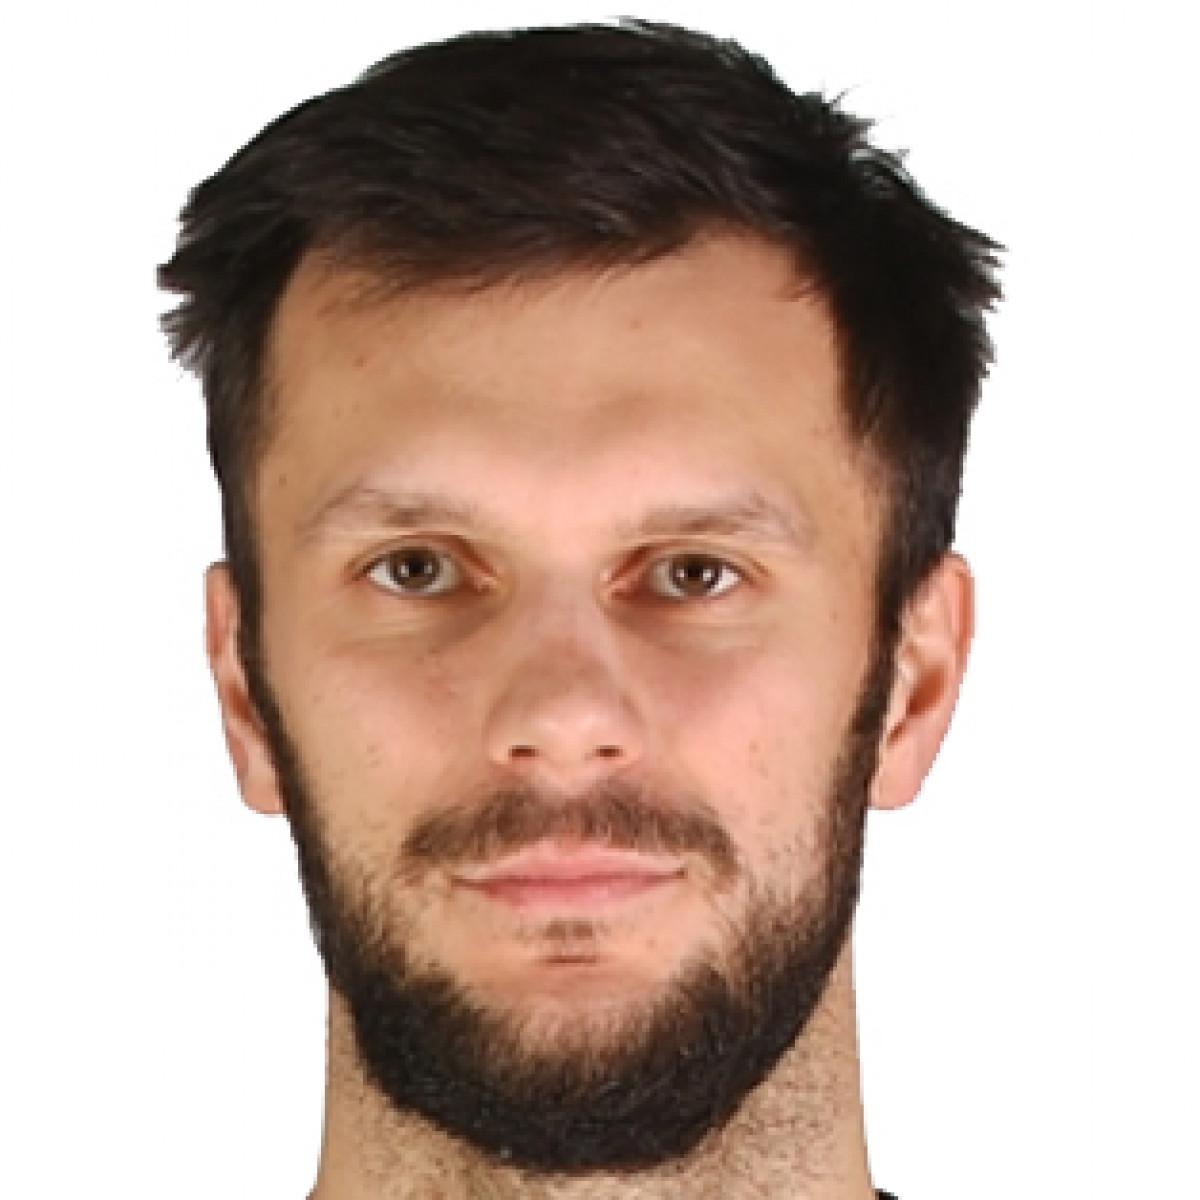 Marek Piechowicz